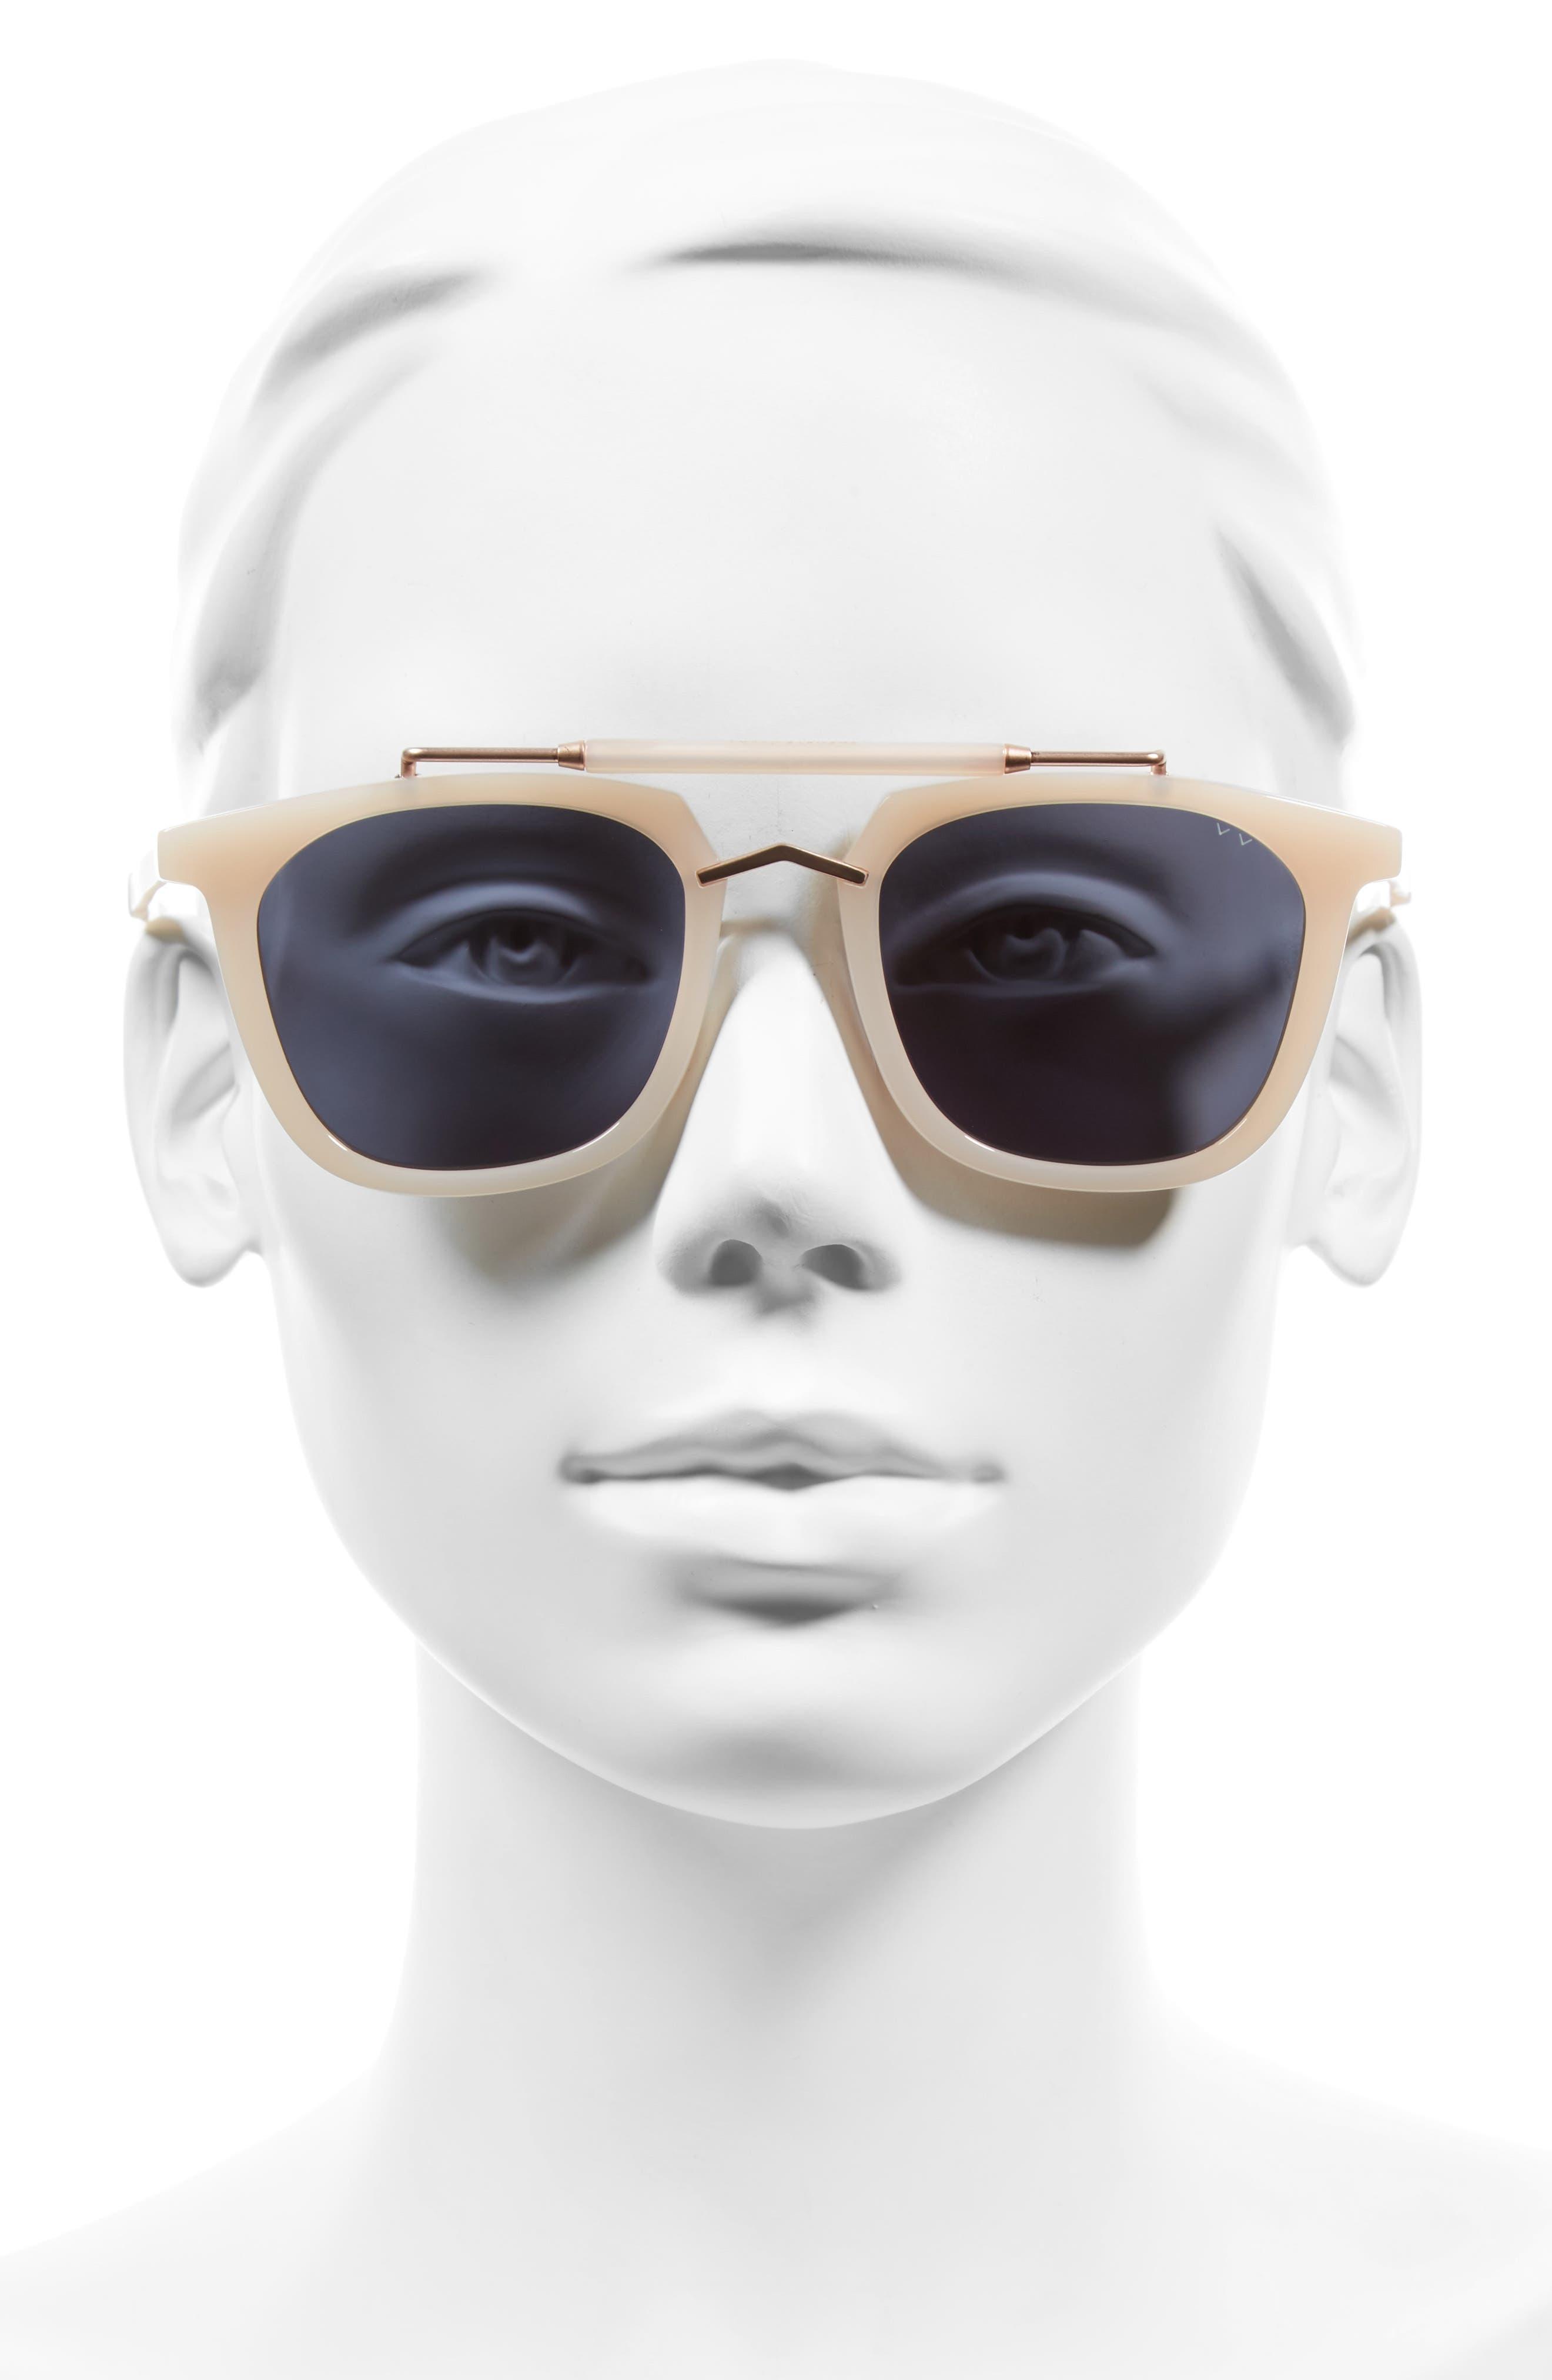 Camels & Caravans 50mm Retro Sunglasses,                             Alternate thumbnail 2, color,                             Blush/ Rose Gold Grey